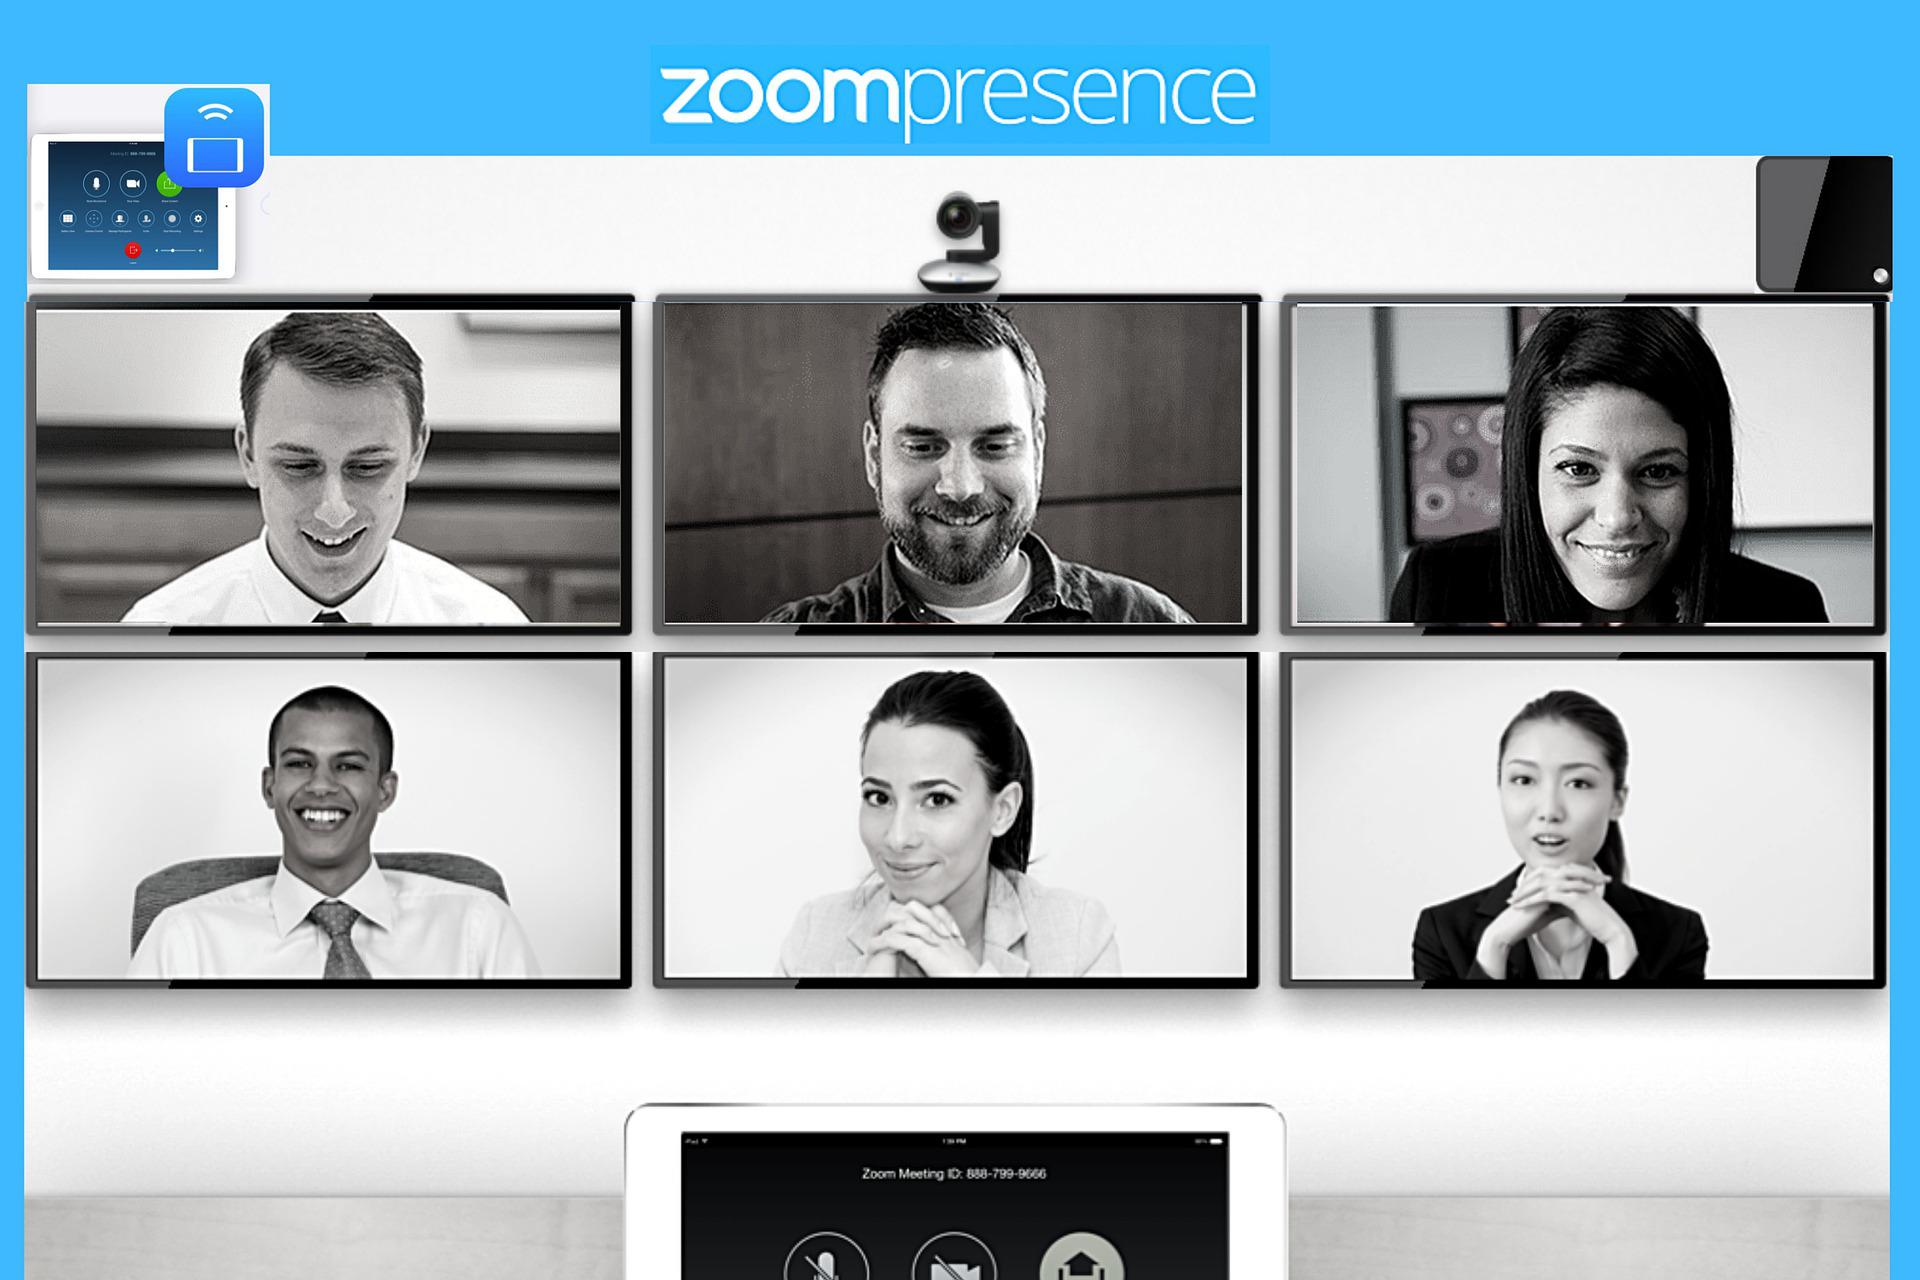 jasa pembayaran zoom meeting